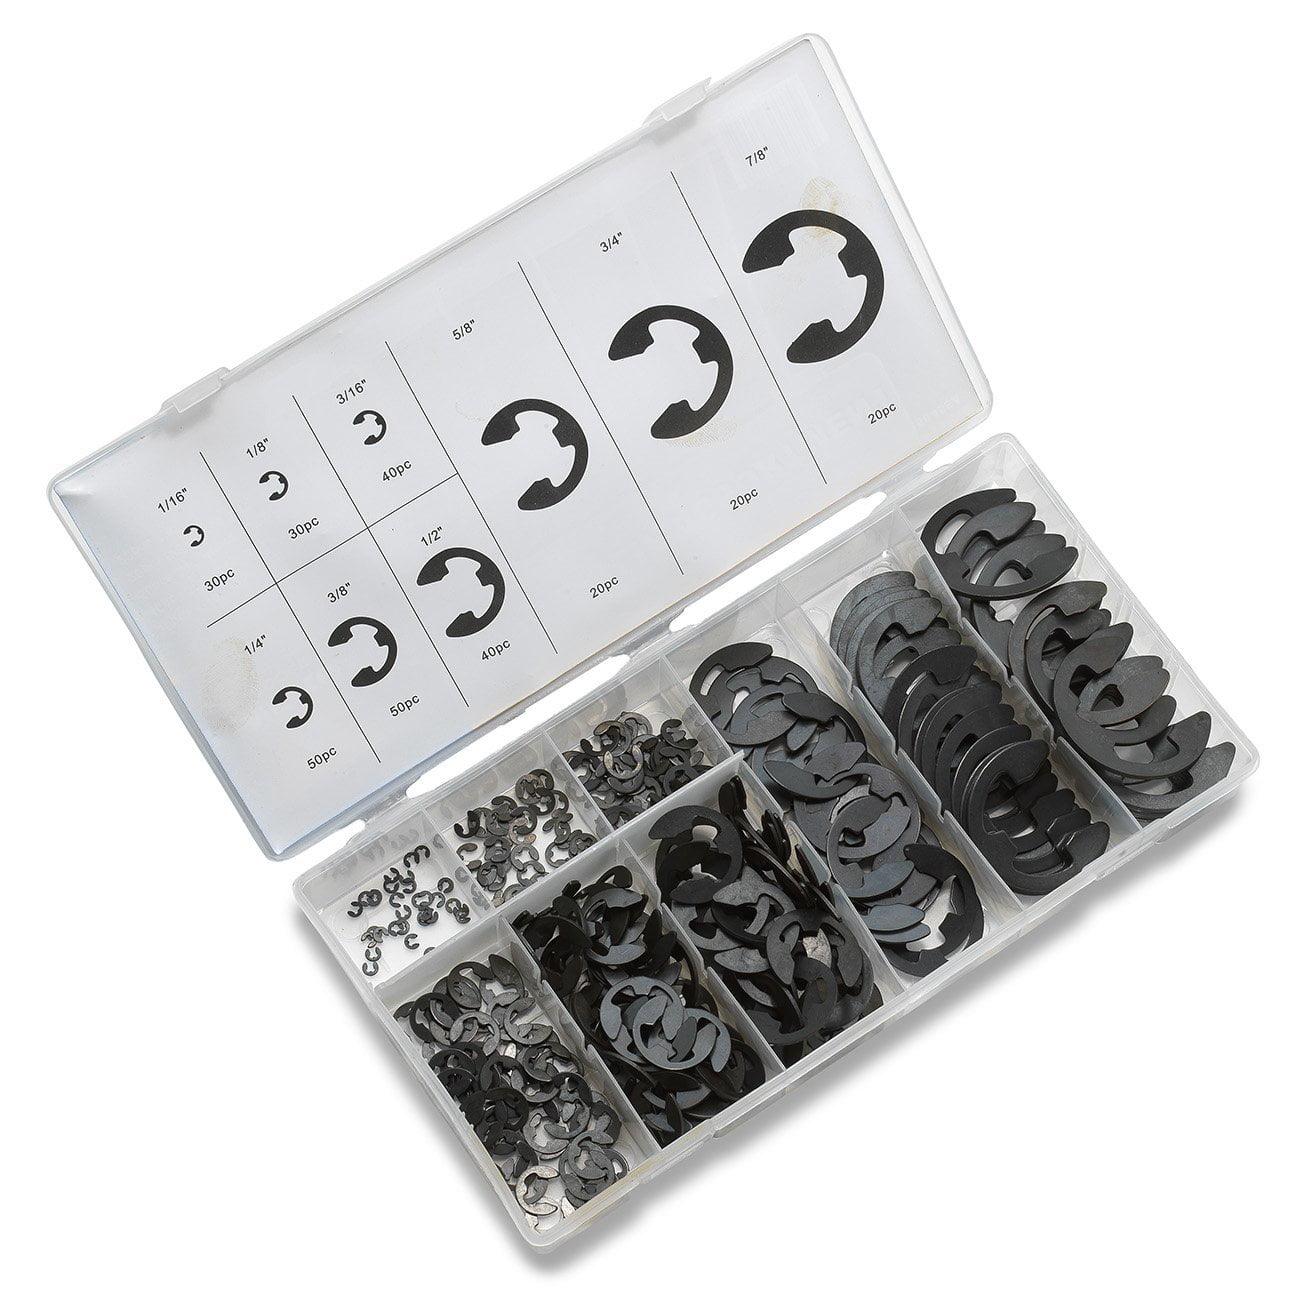 Neiko E-Clip Assortment Kit (300-pack) (9 sizes)